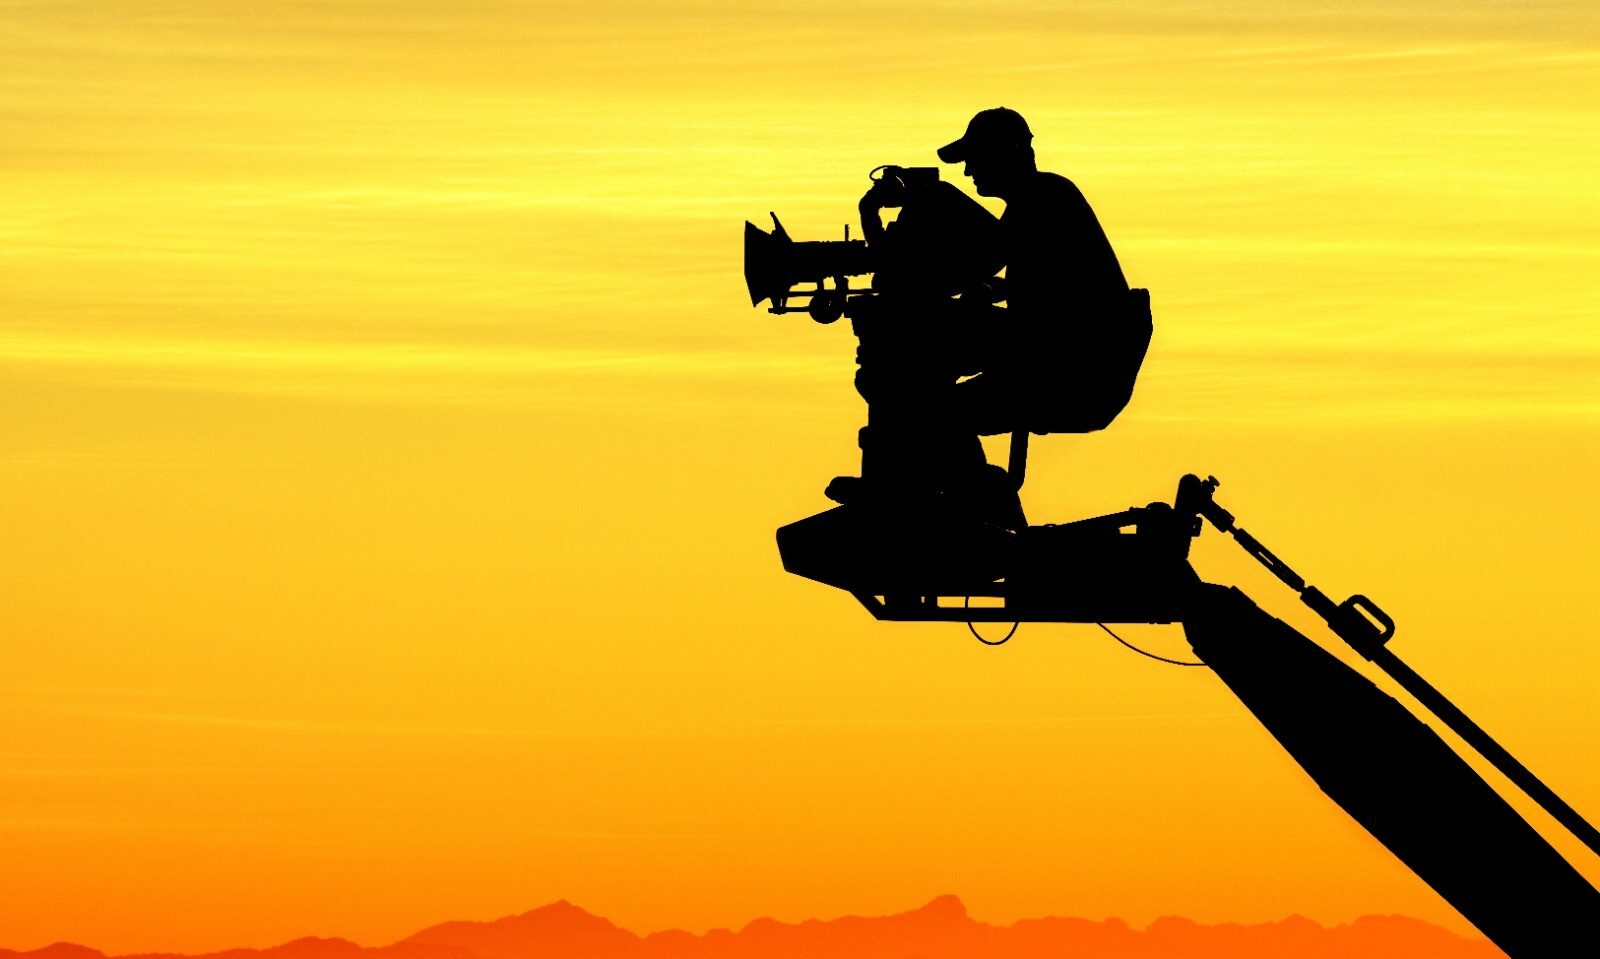 A Film, TV and Media Funding Dilemma: Bridging the Gap